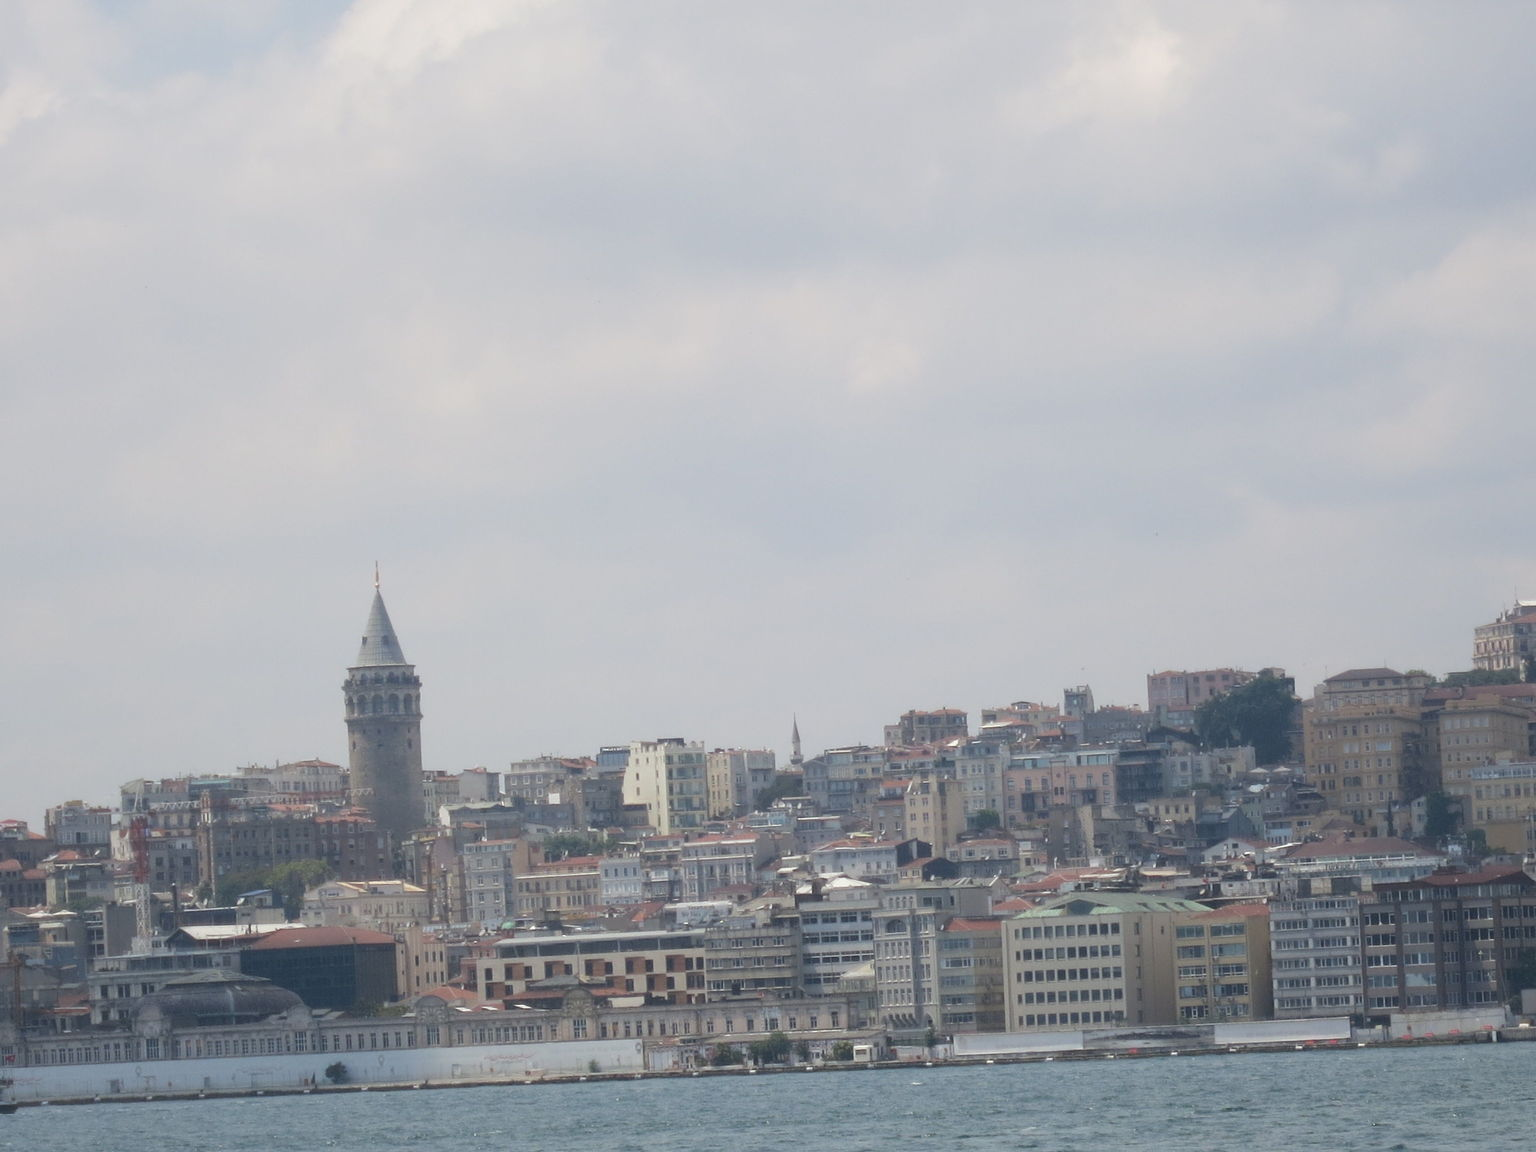 MAIS FOTOS, Bosphorus Strait Cruise com Rumeli Fortress or Kücüksu Palace Tour